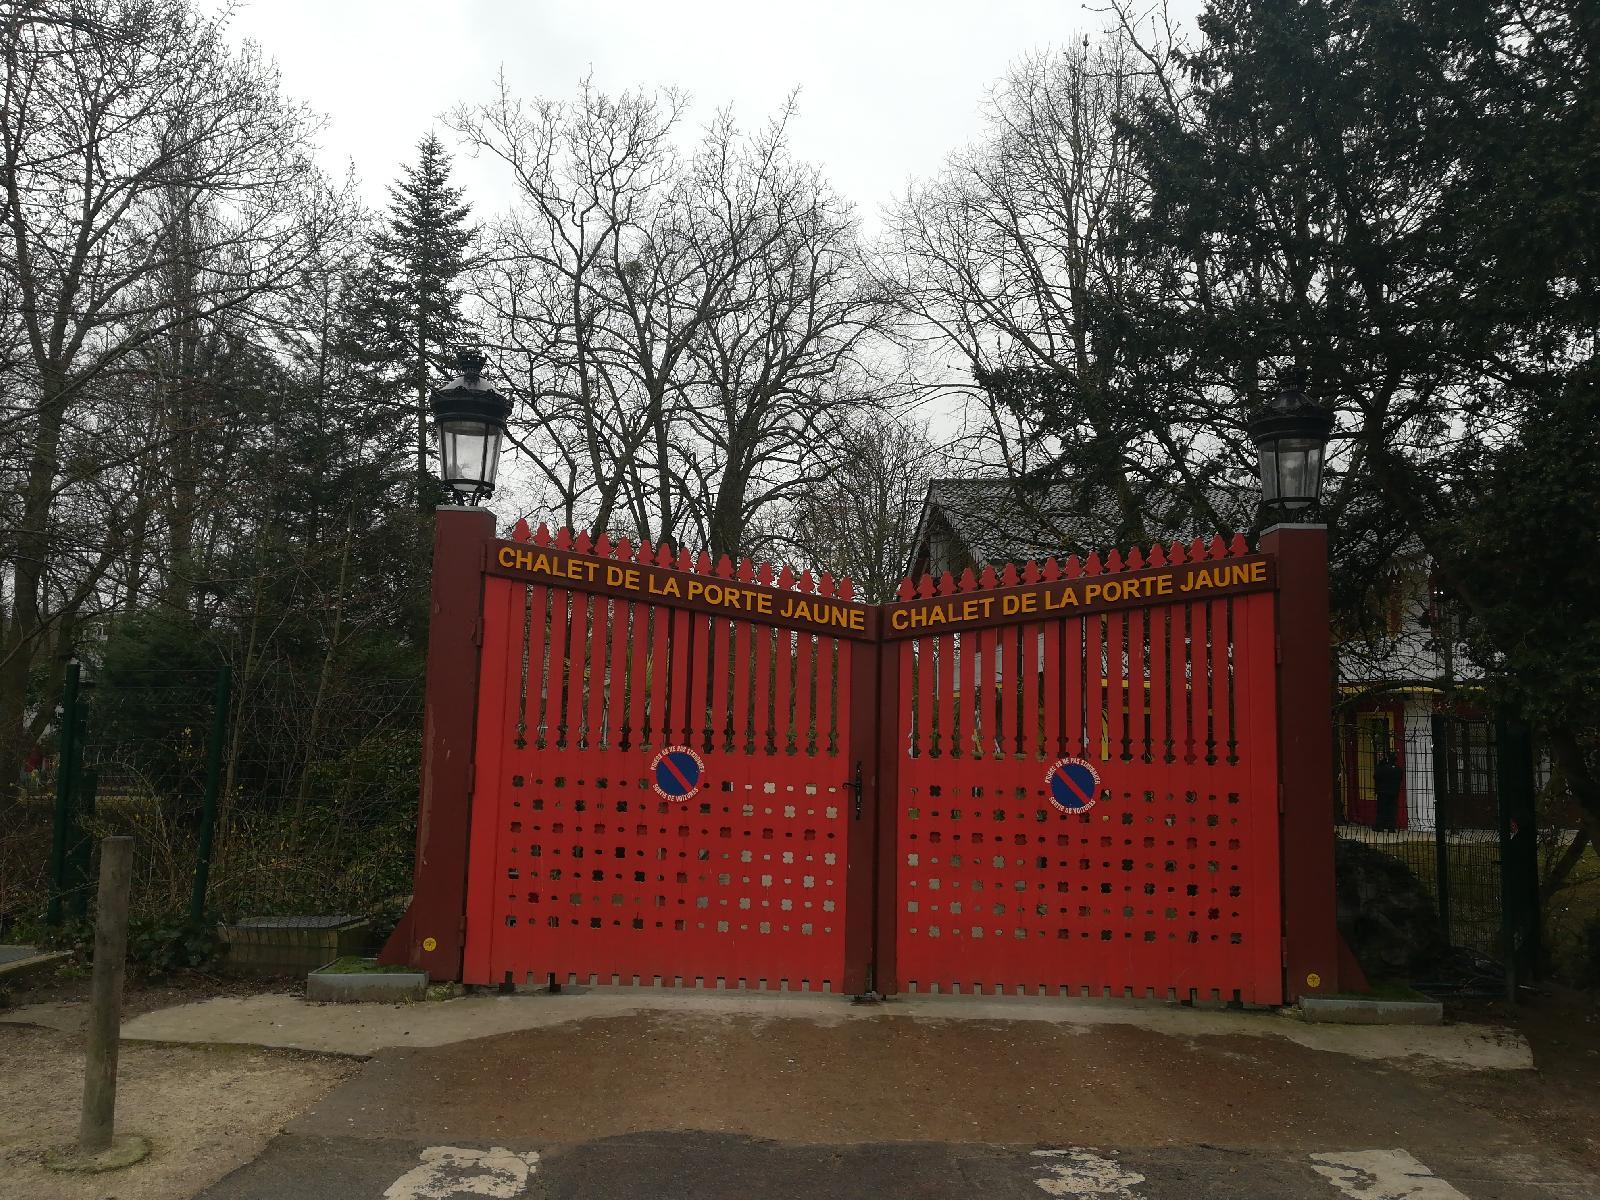 Bibliothèque De Fontenay Sous Bois fontenay sous bois - fontenay sous bois - le bois de